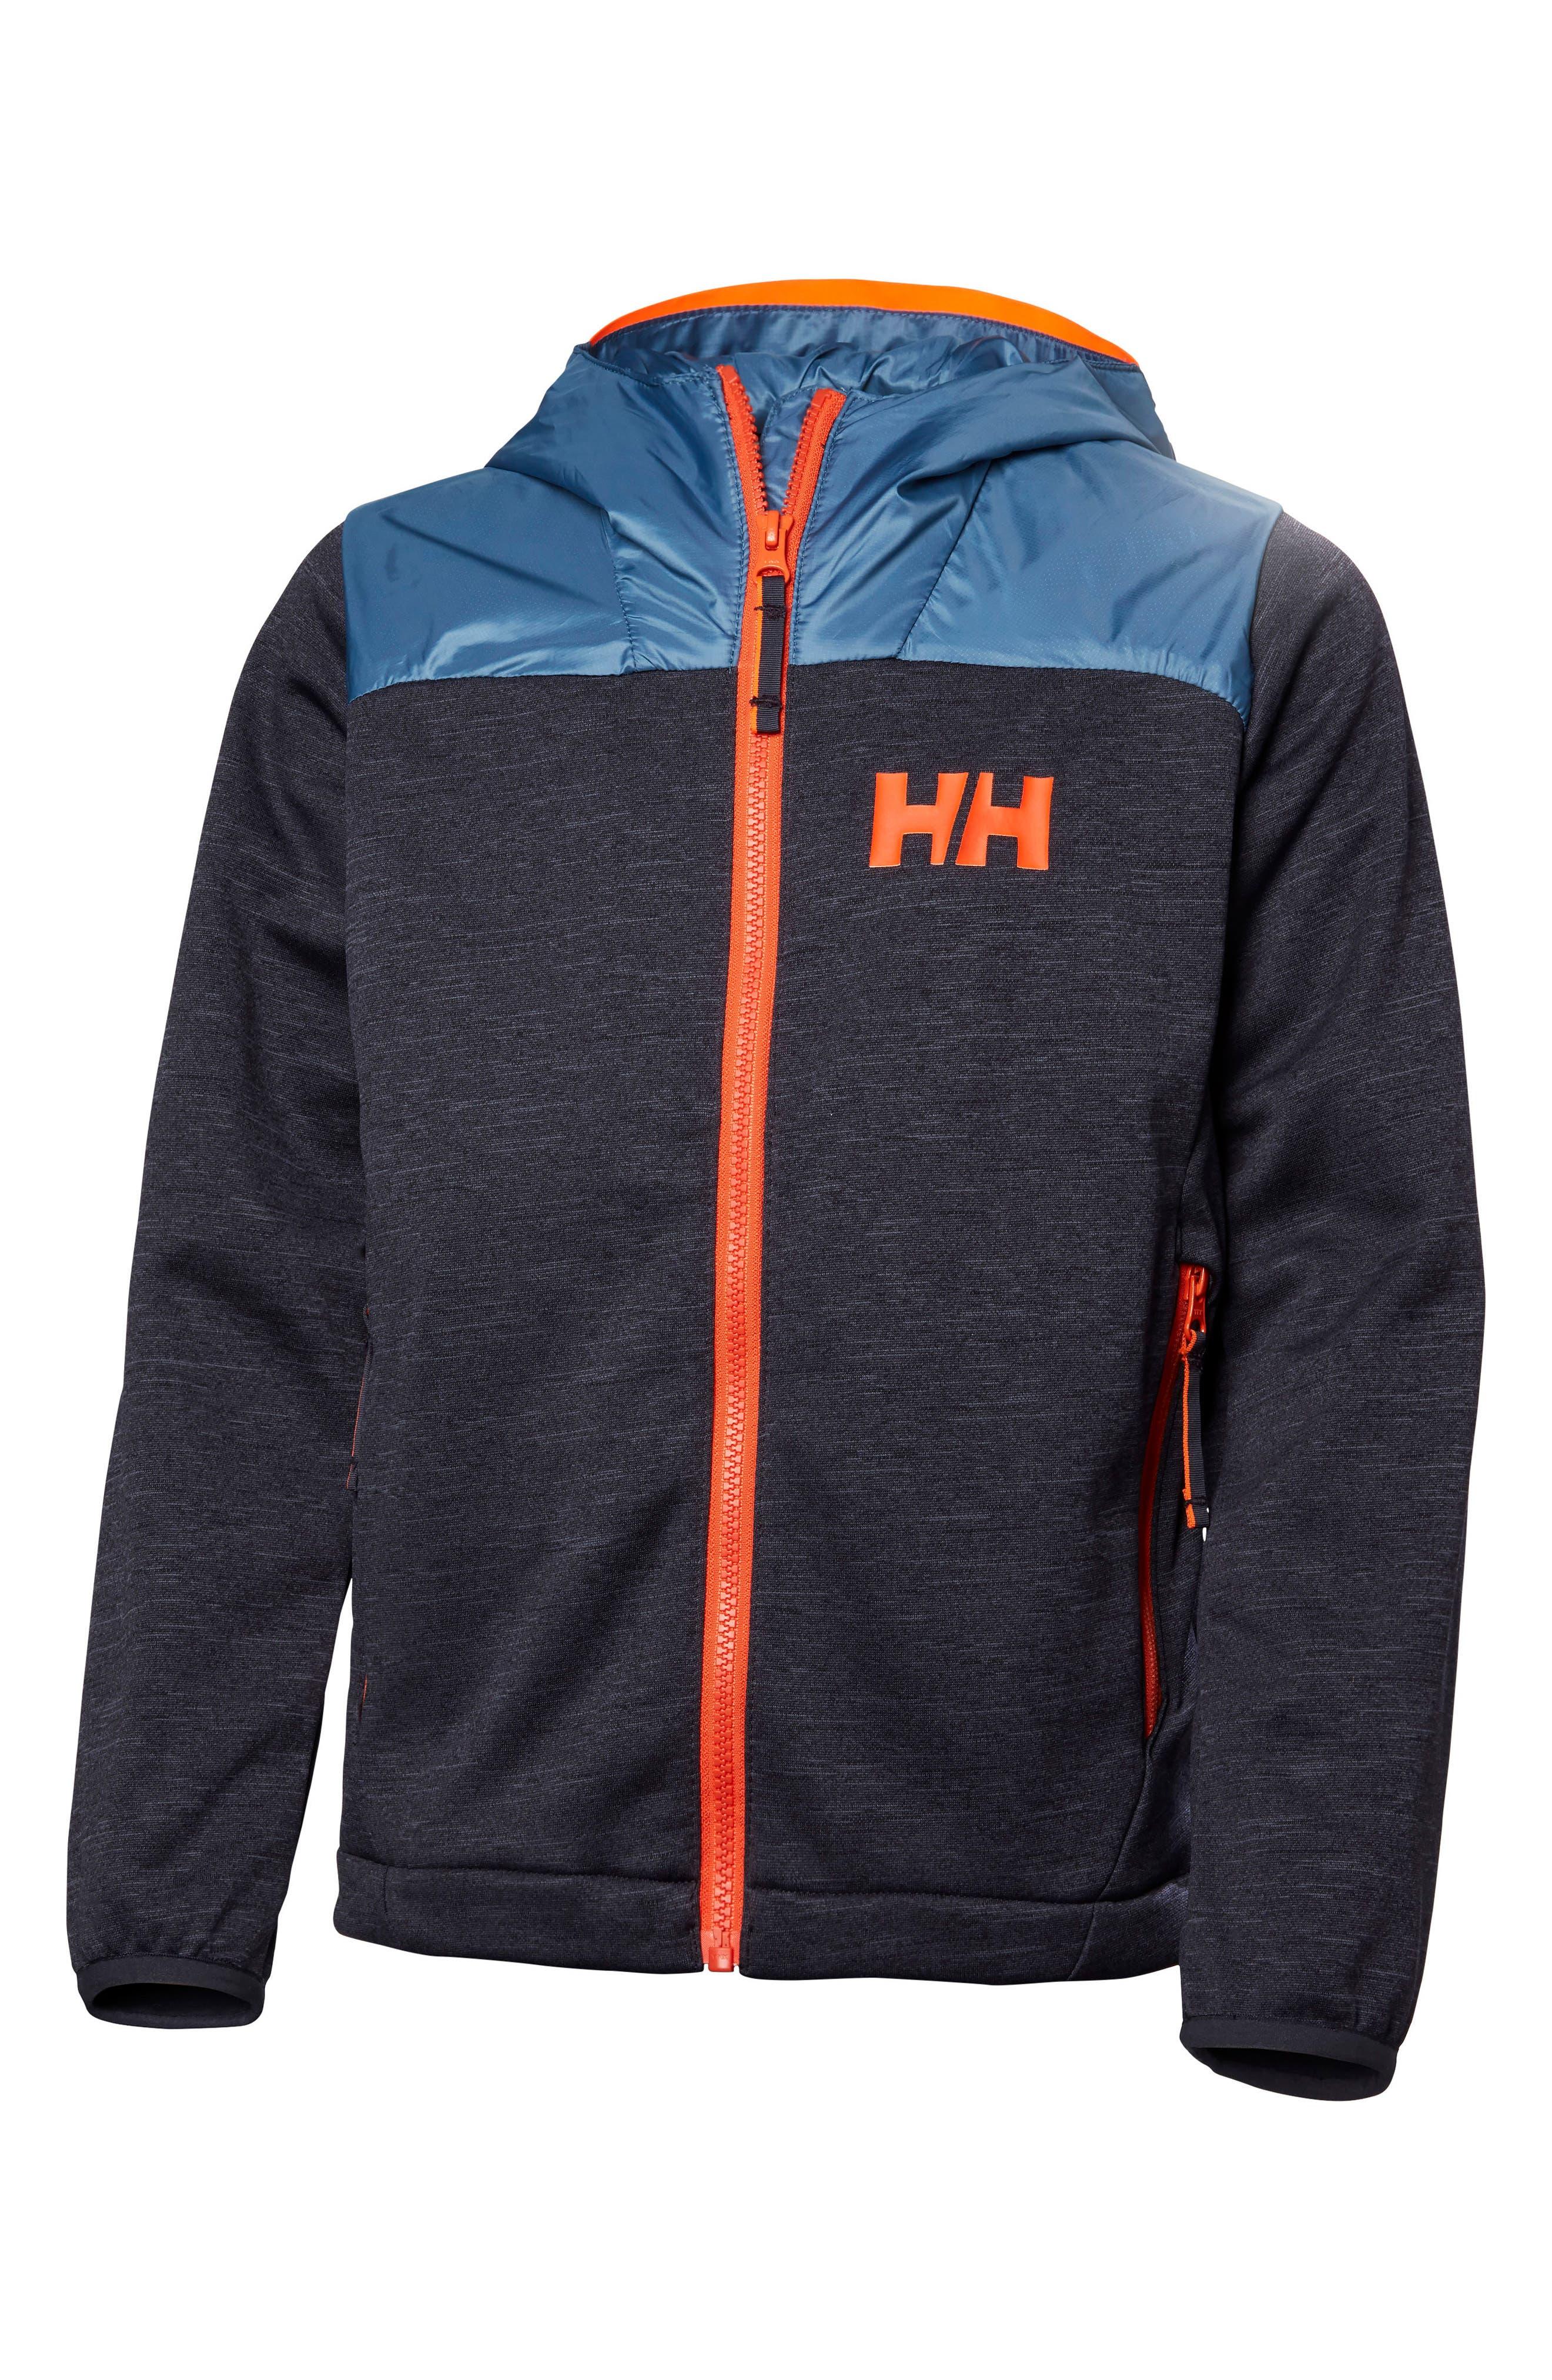 Hybrid Midlayer Jacket,                         Main,                         color, 404